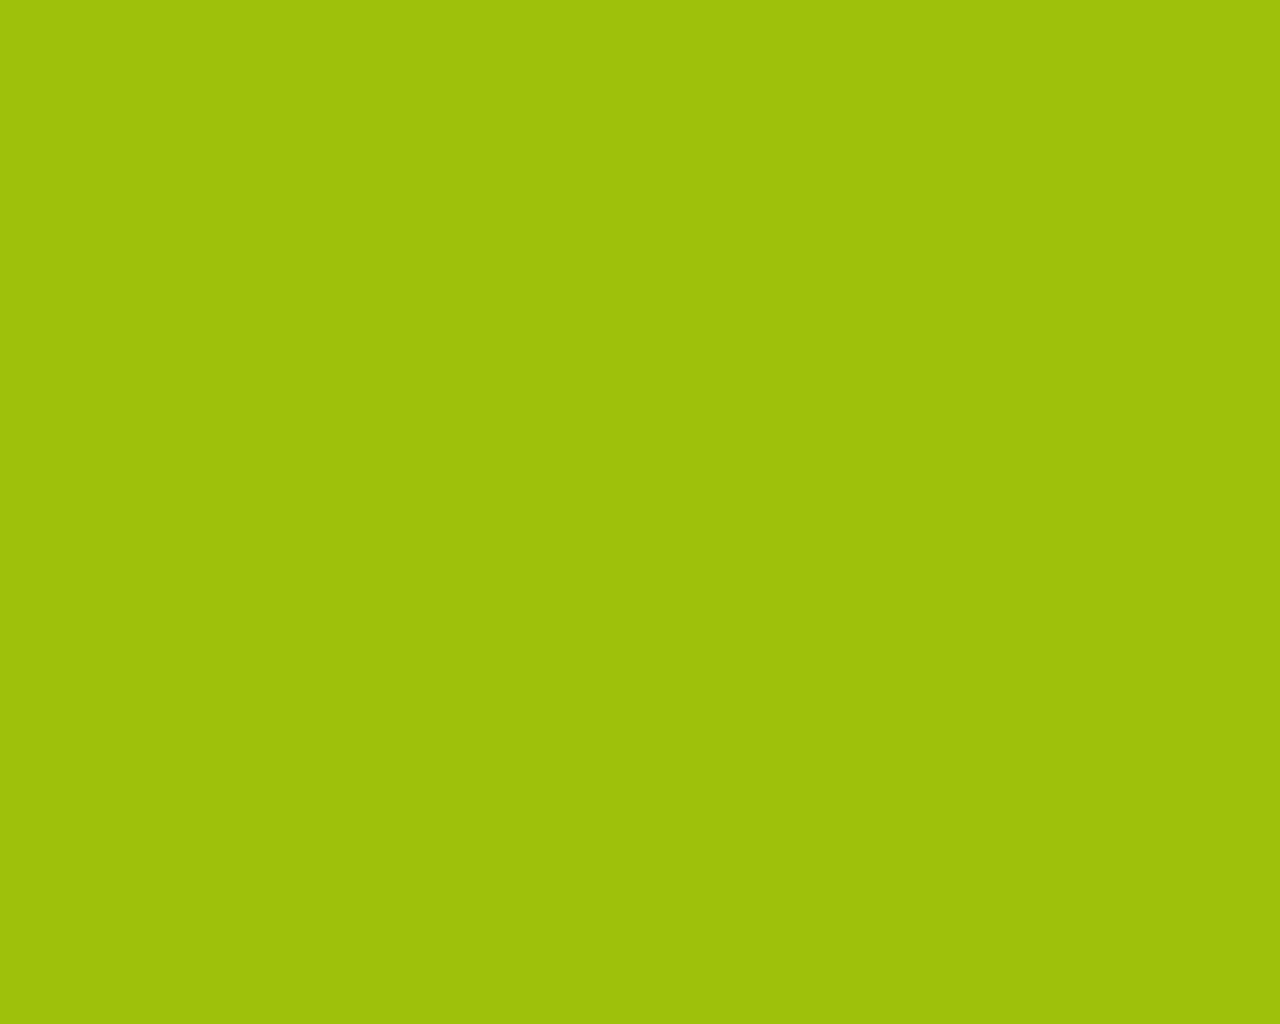 1280x1024 Limerick Solid Color Background